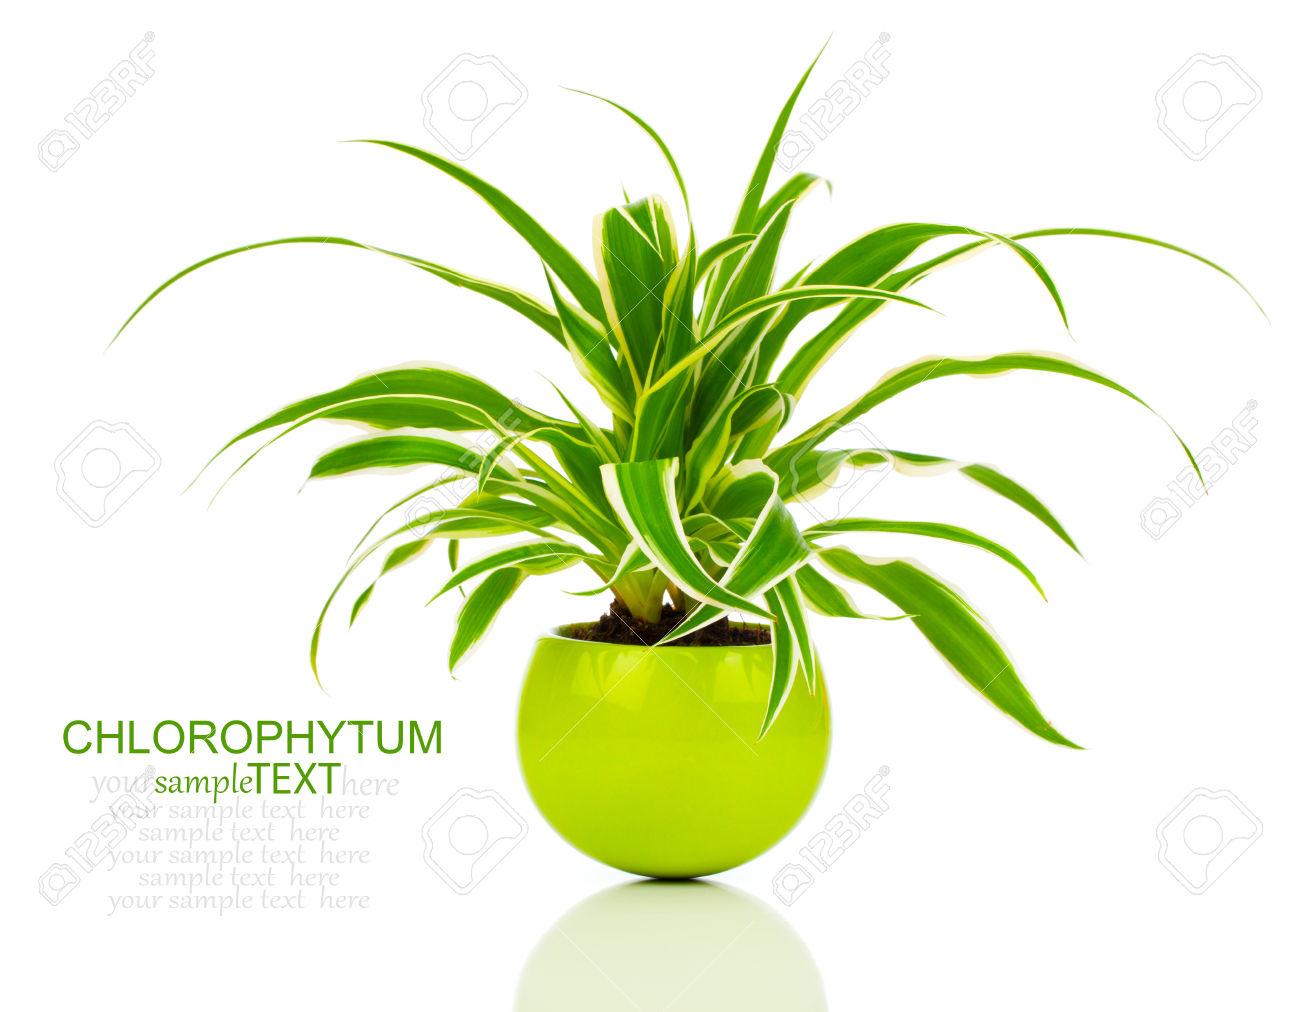 Green Chlorophytum Plant In The Pot, Evergreen Perennial Flowering.